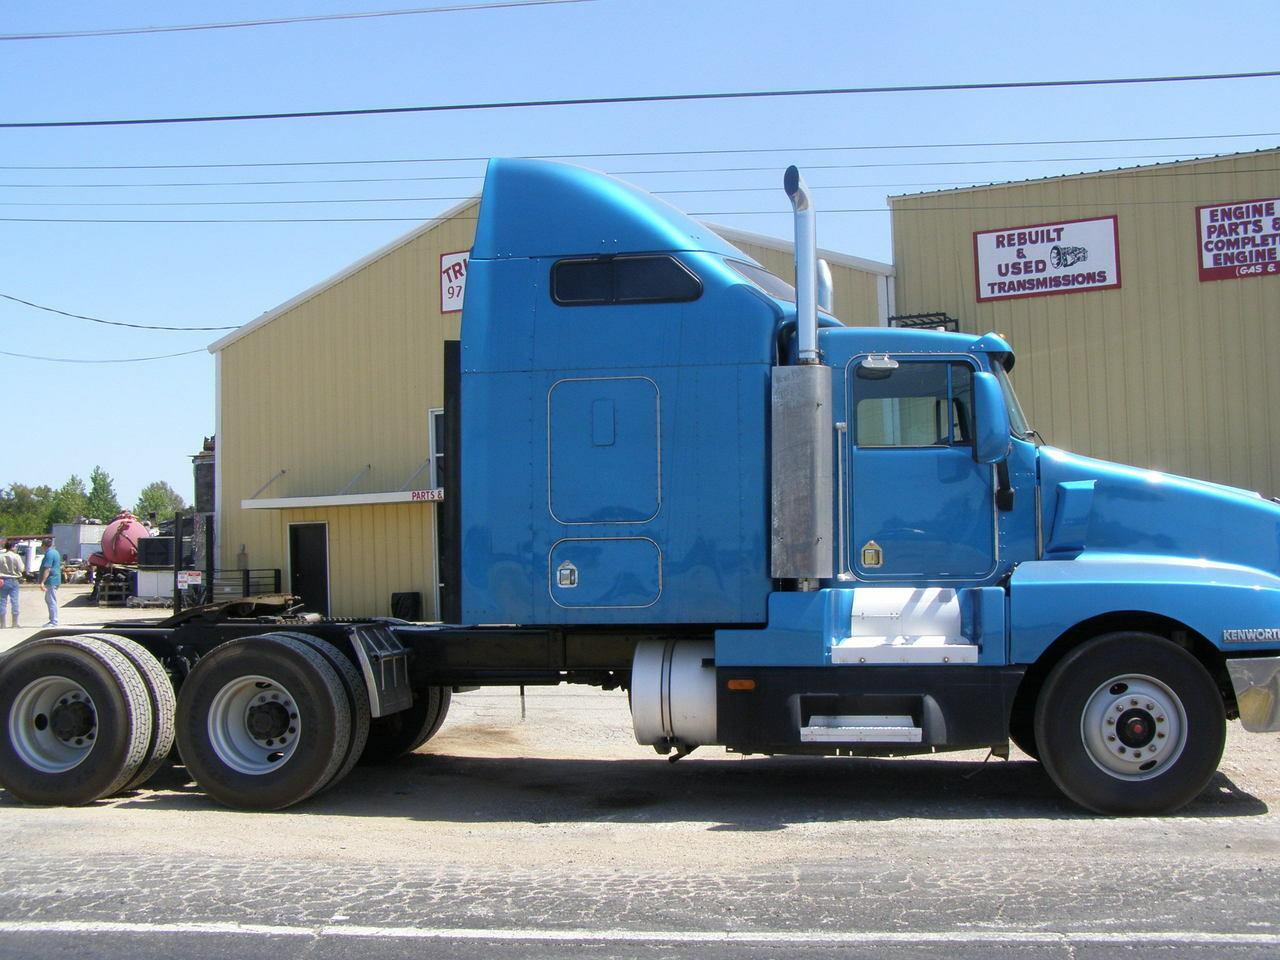 1994 Kenworth T600, Dallas TX - 119319973 - CommercialTruckTrader.com